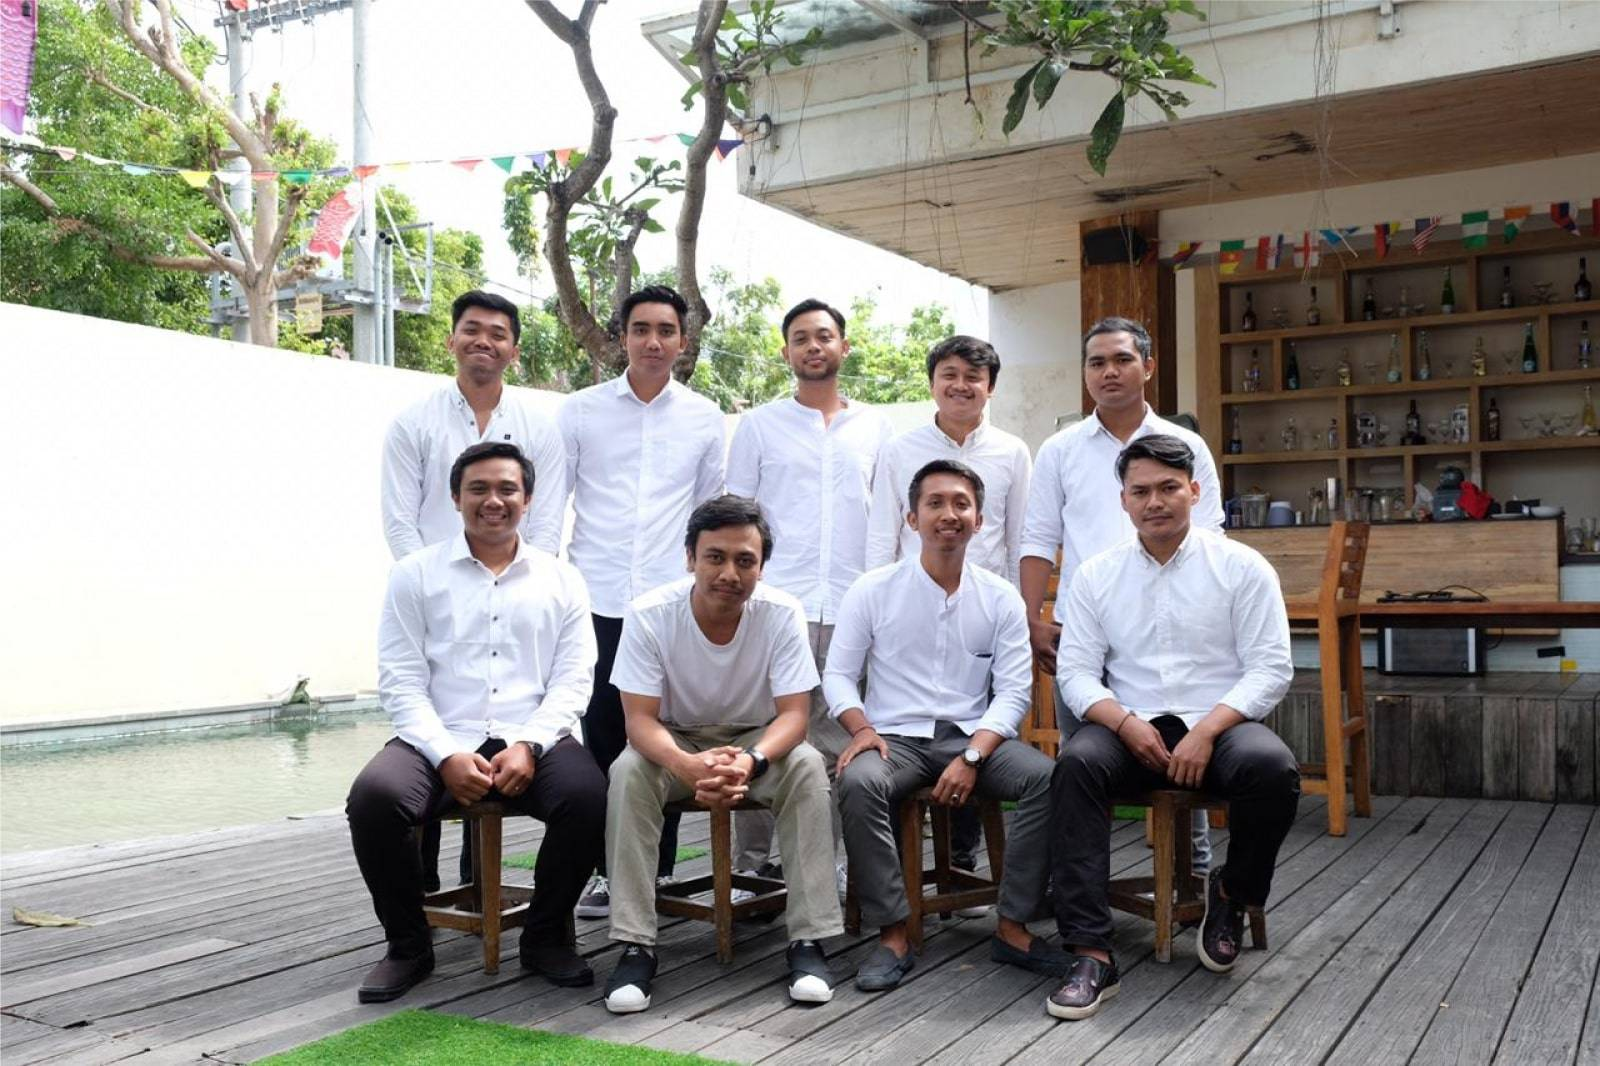 Bali Emporio Architect Team Performs Photo Together at Ayucious, Denpasar 8